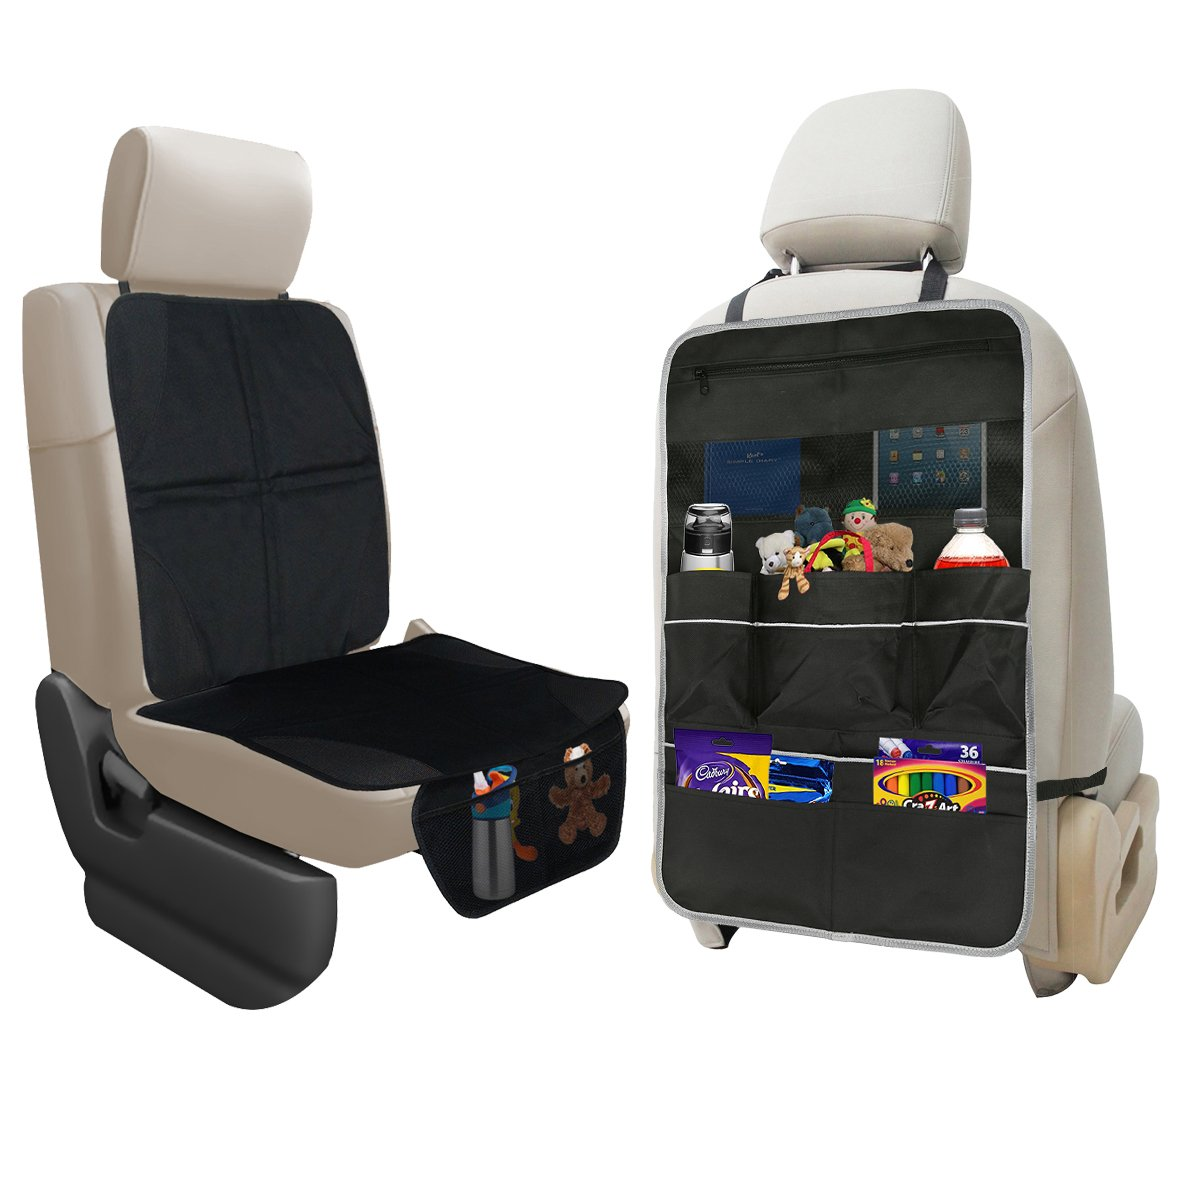 7 Pocket Storage Car Seat Back Organizer /& Kick Mat Protector X-Large Kids Toys and Travel Accessories Organizer lebogner Car Seat Protector Durable Quality Seat Covers Backseat Organizer